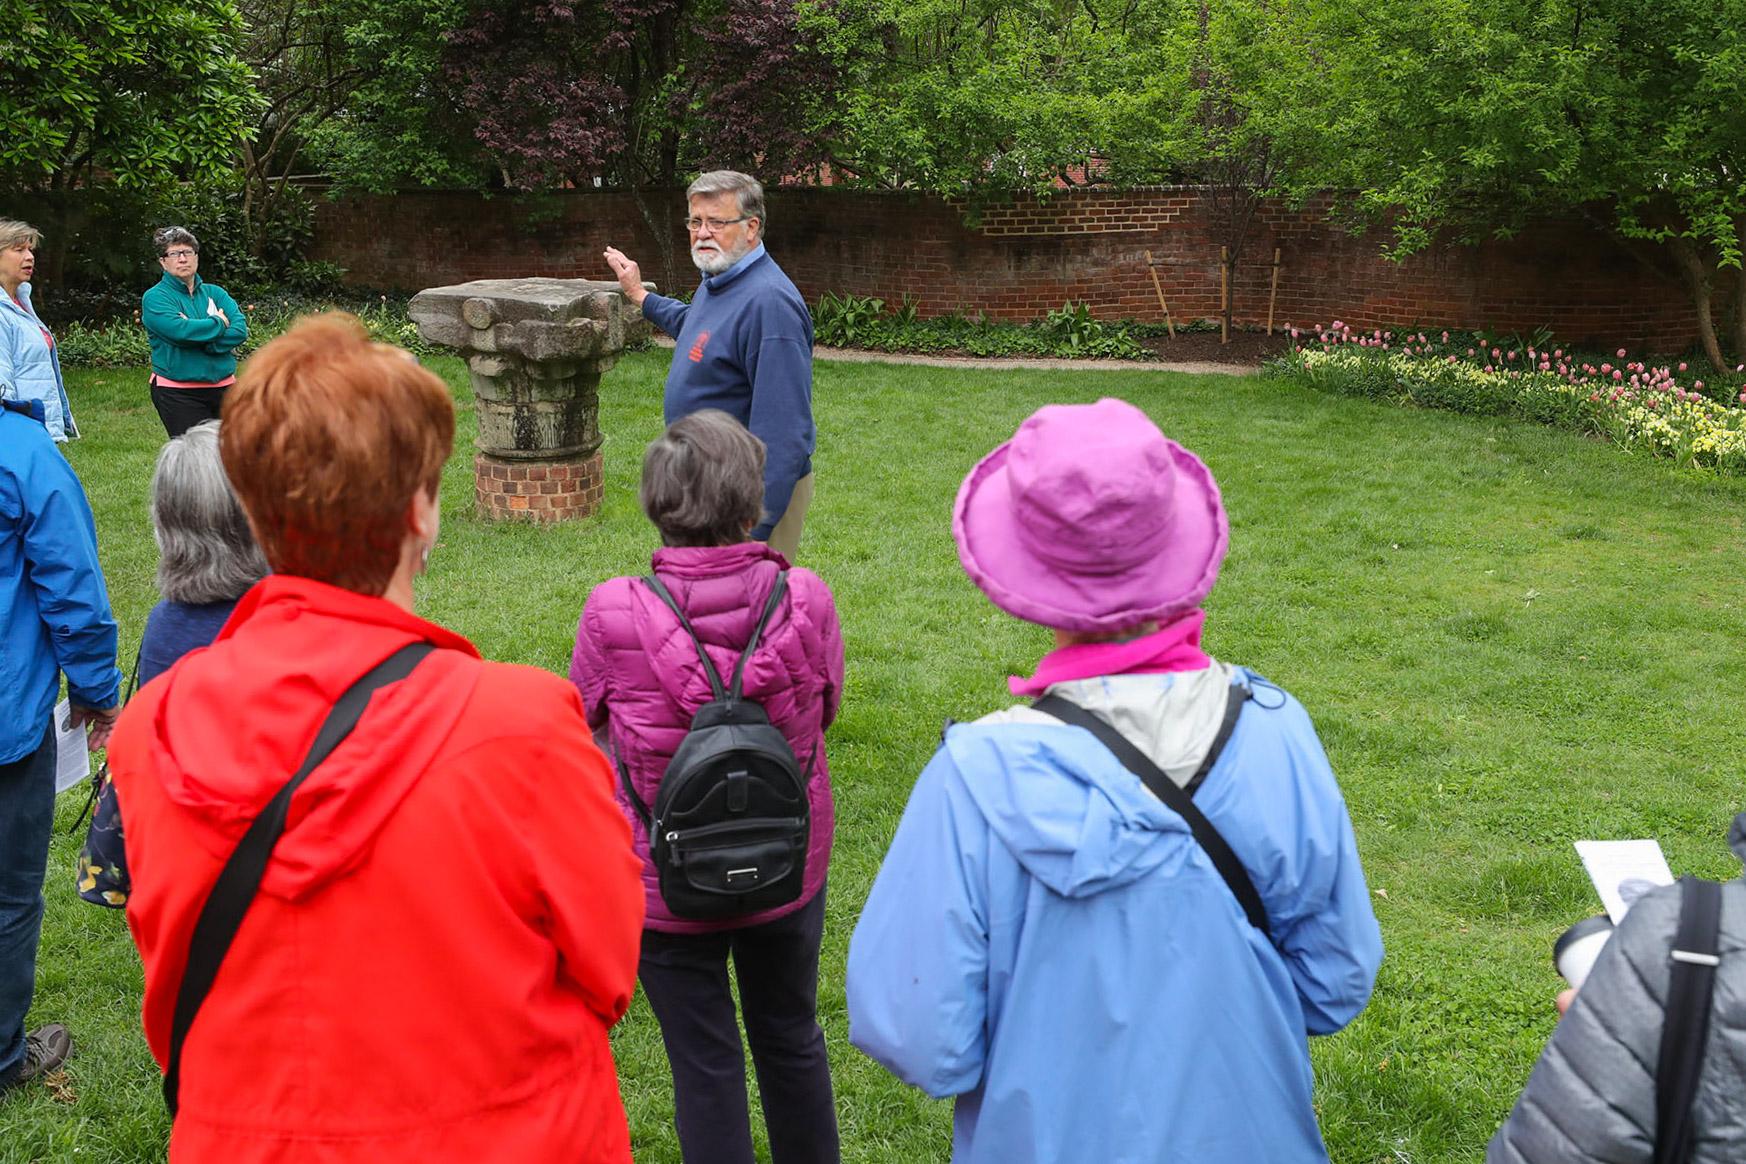 : UVA gardener John Sauer, who works in Facilities Management's landscaping division, led garden tours for Historic Garden Week, starting here in the Pavilion I garden.